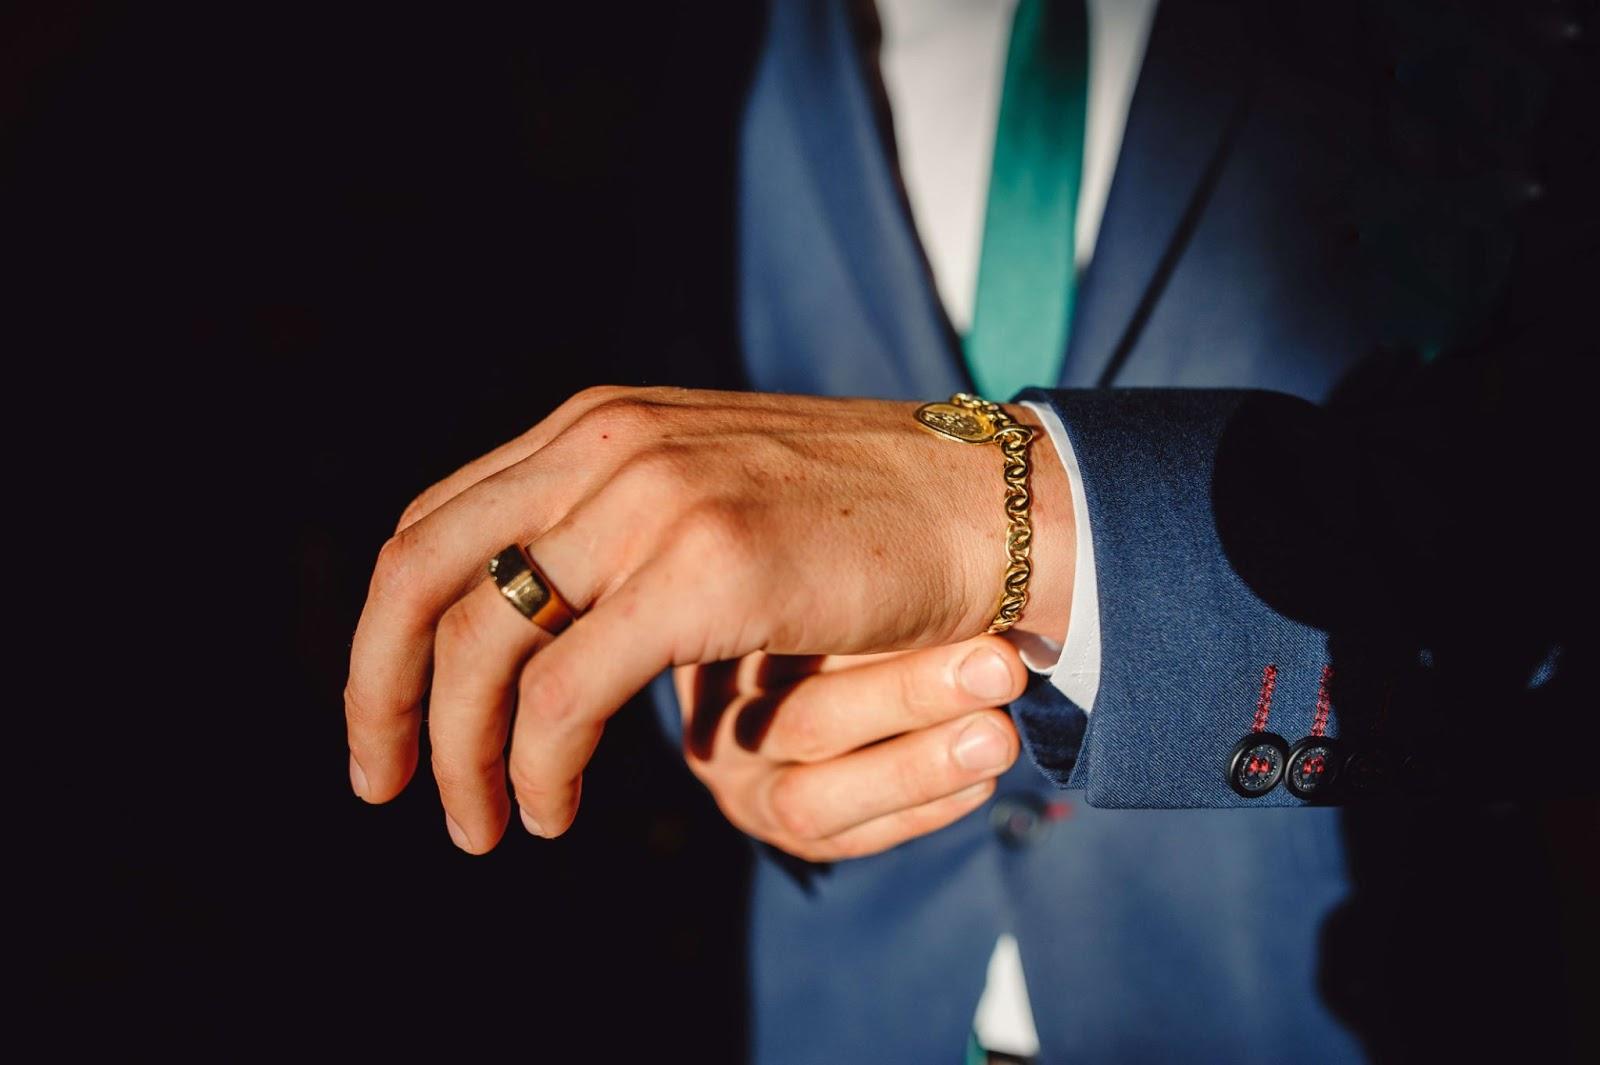 Man putting on bracelet